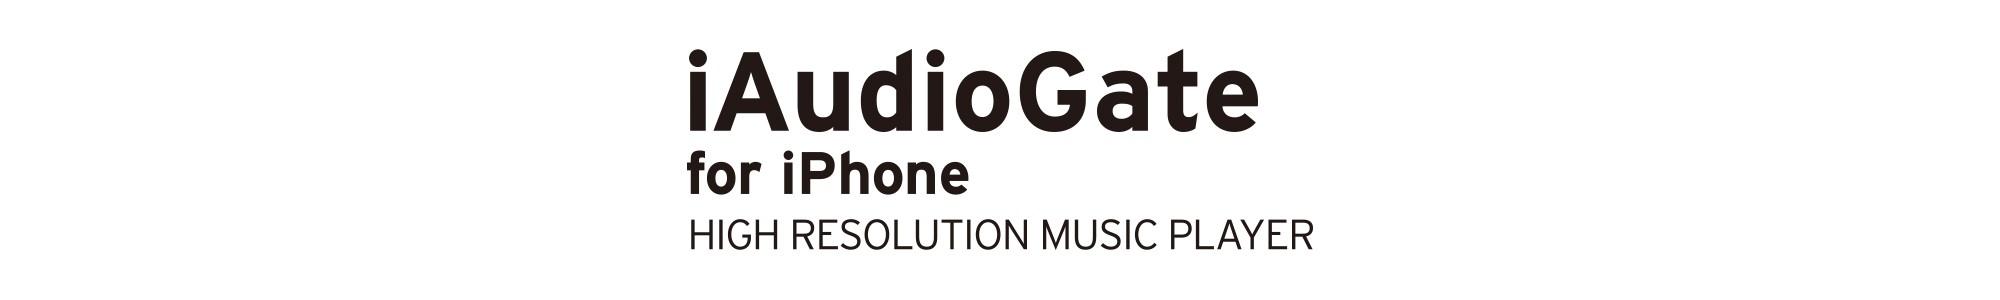 iAudioGate